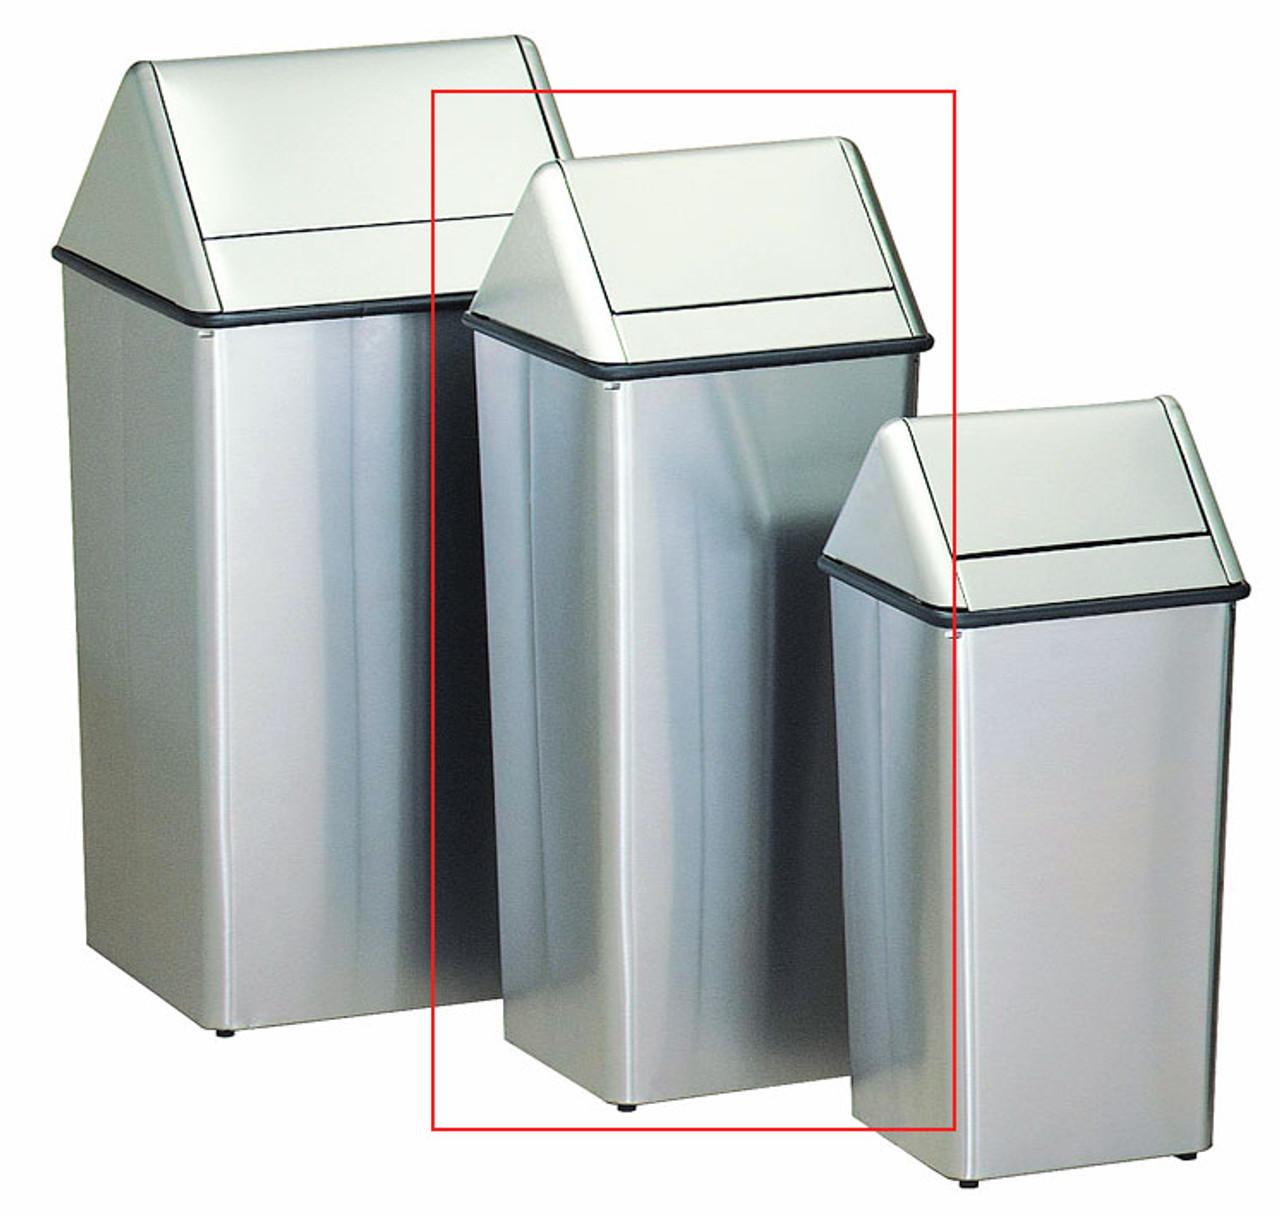 Metal Stainless Steel 21 Gallon Swing Top Waste Receptacle 1411HTSS